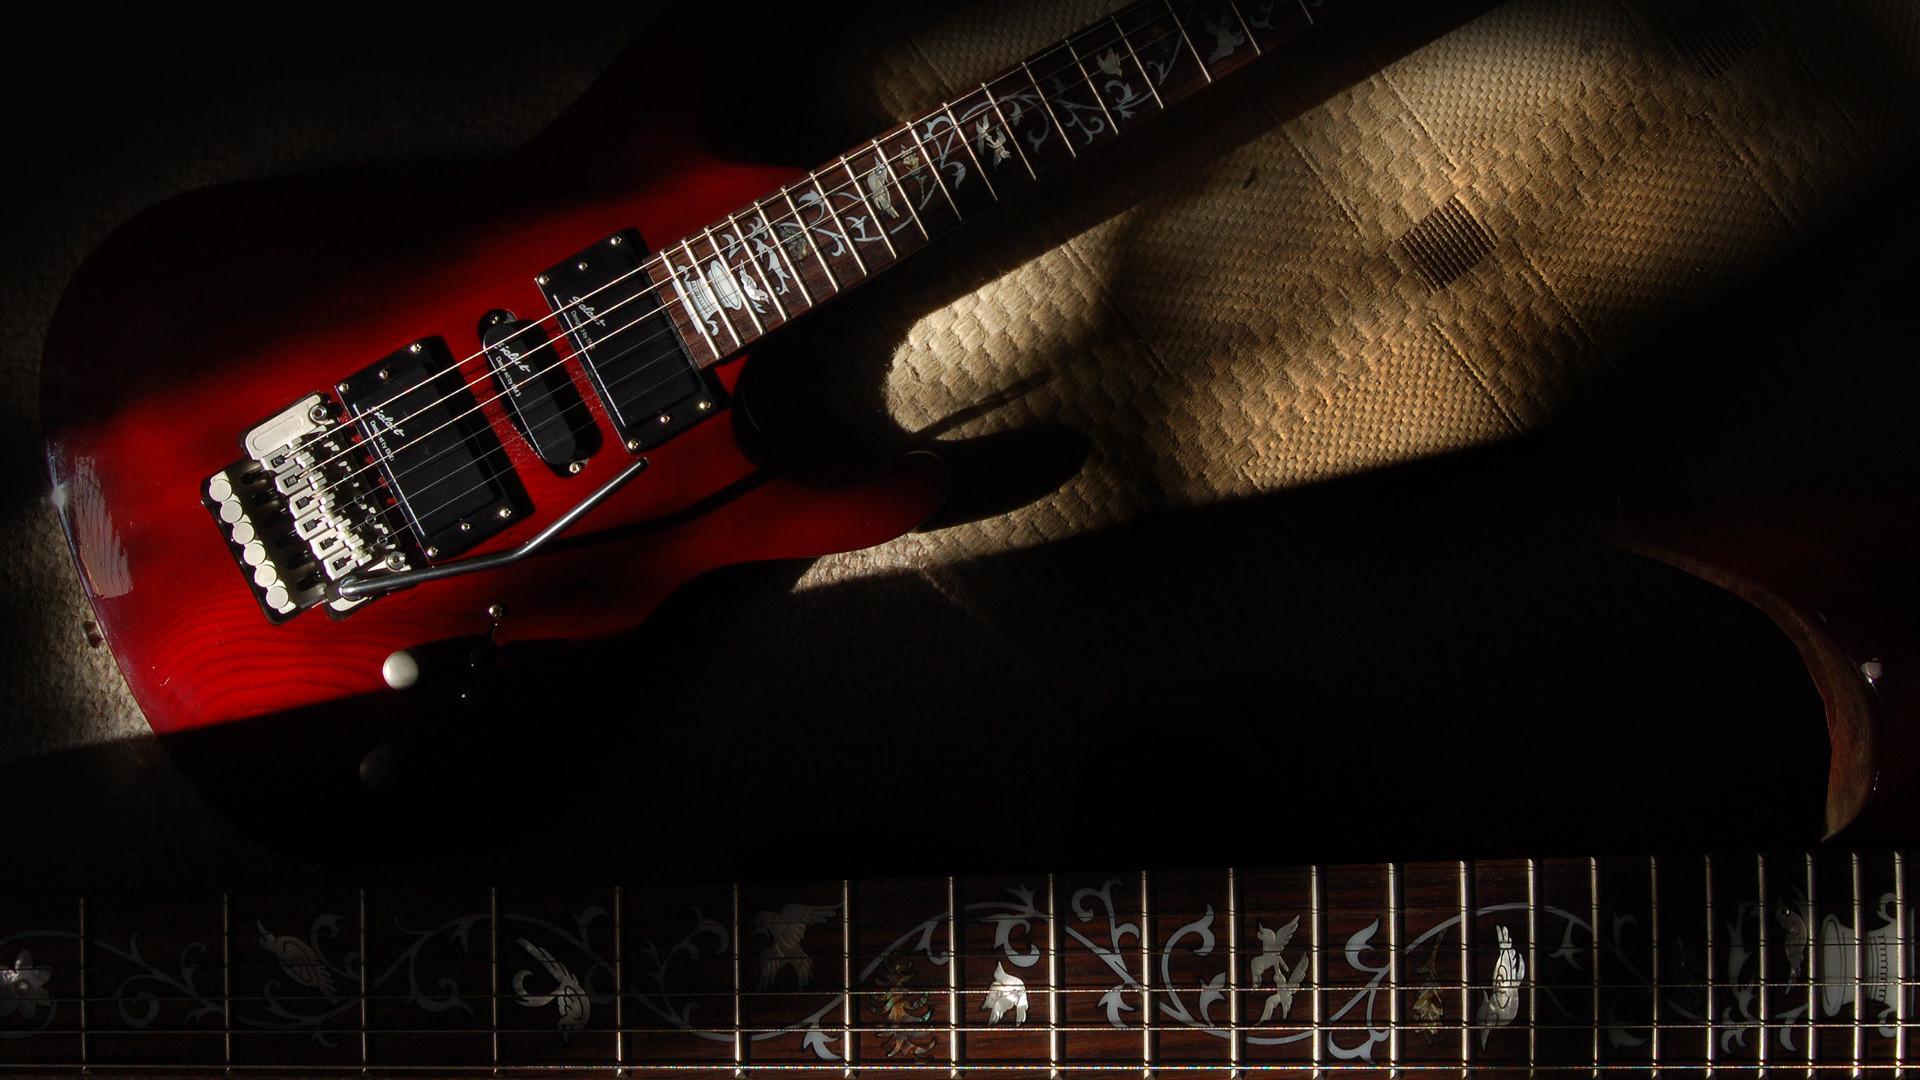 Guitar wallpaper, Shine Sil 62 electric guitar